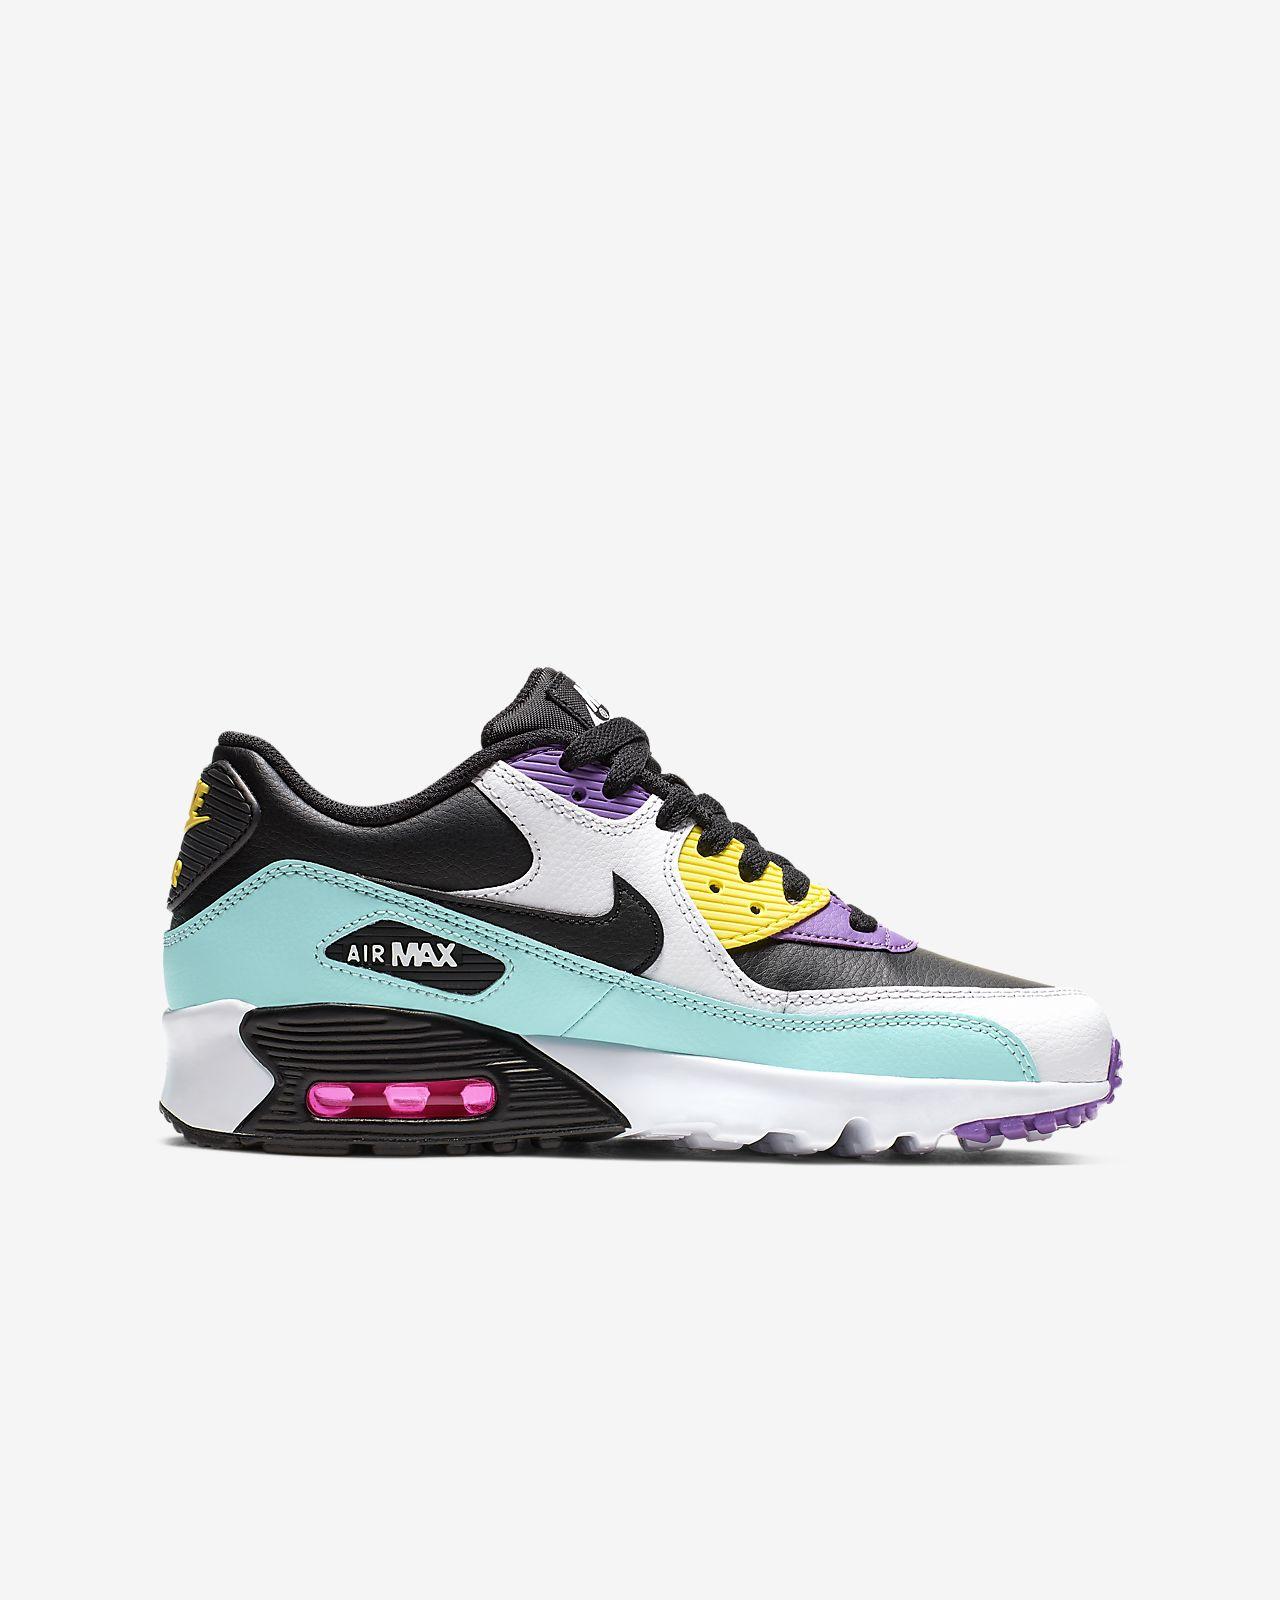 eb869b9c79e Nike Air Max 90 Leather Big Kids' Shoe